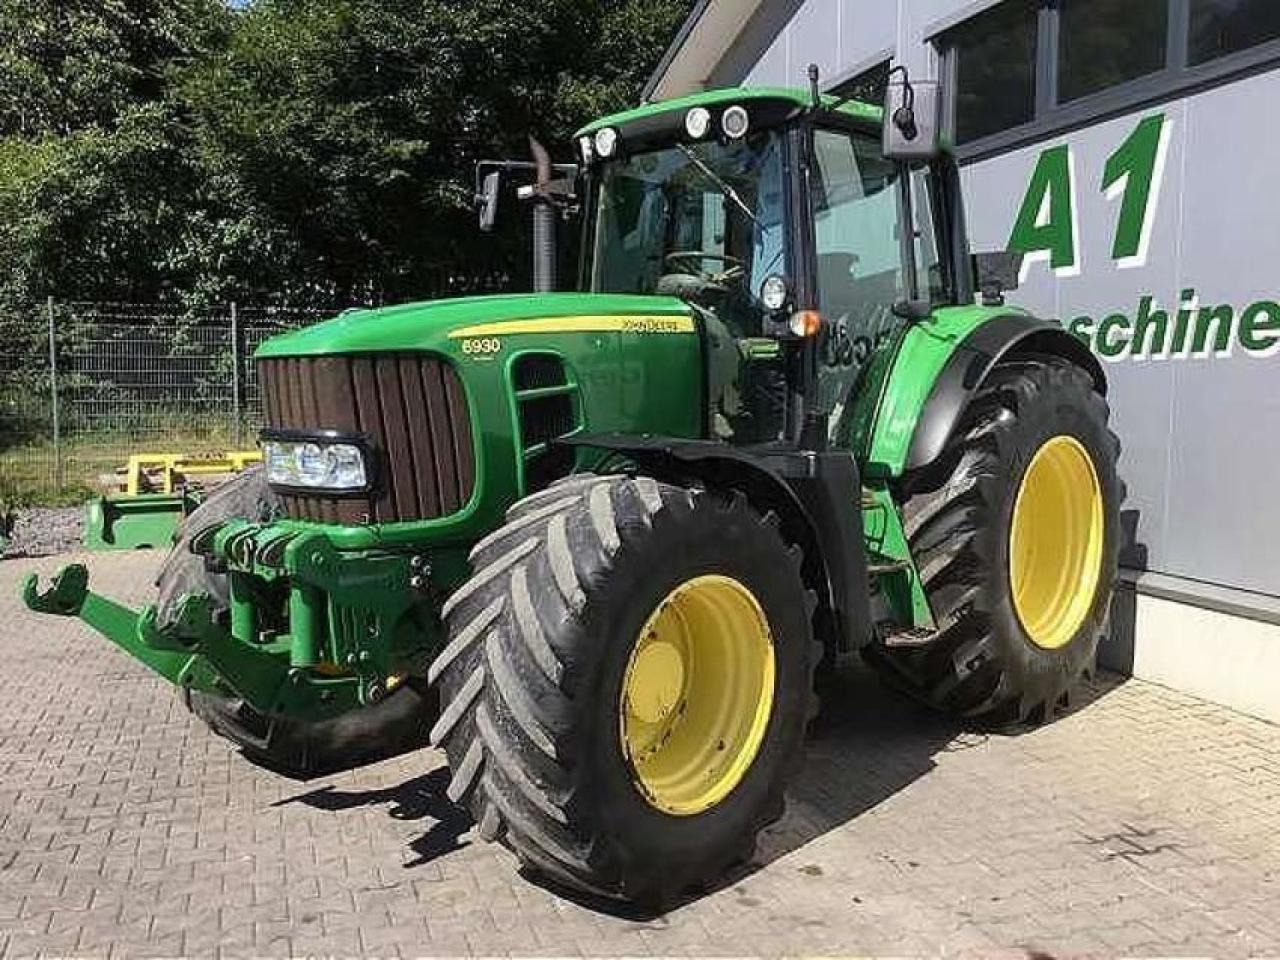 John Deere 6930 Premium Tarım Traktör — 3846000 avec Image Tracteur John Deere